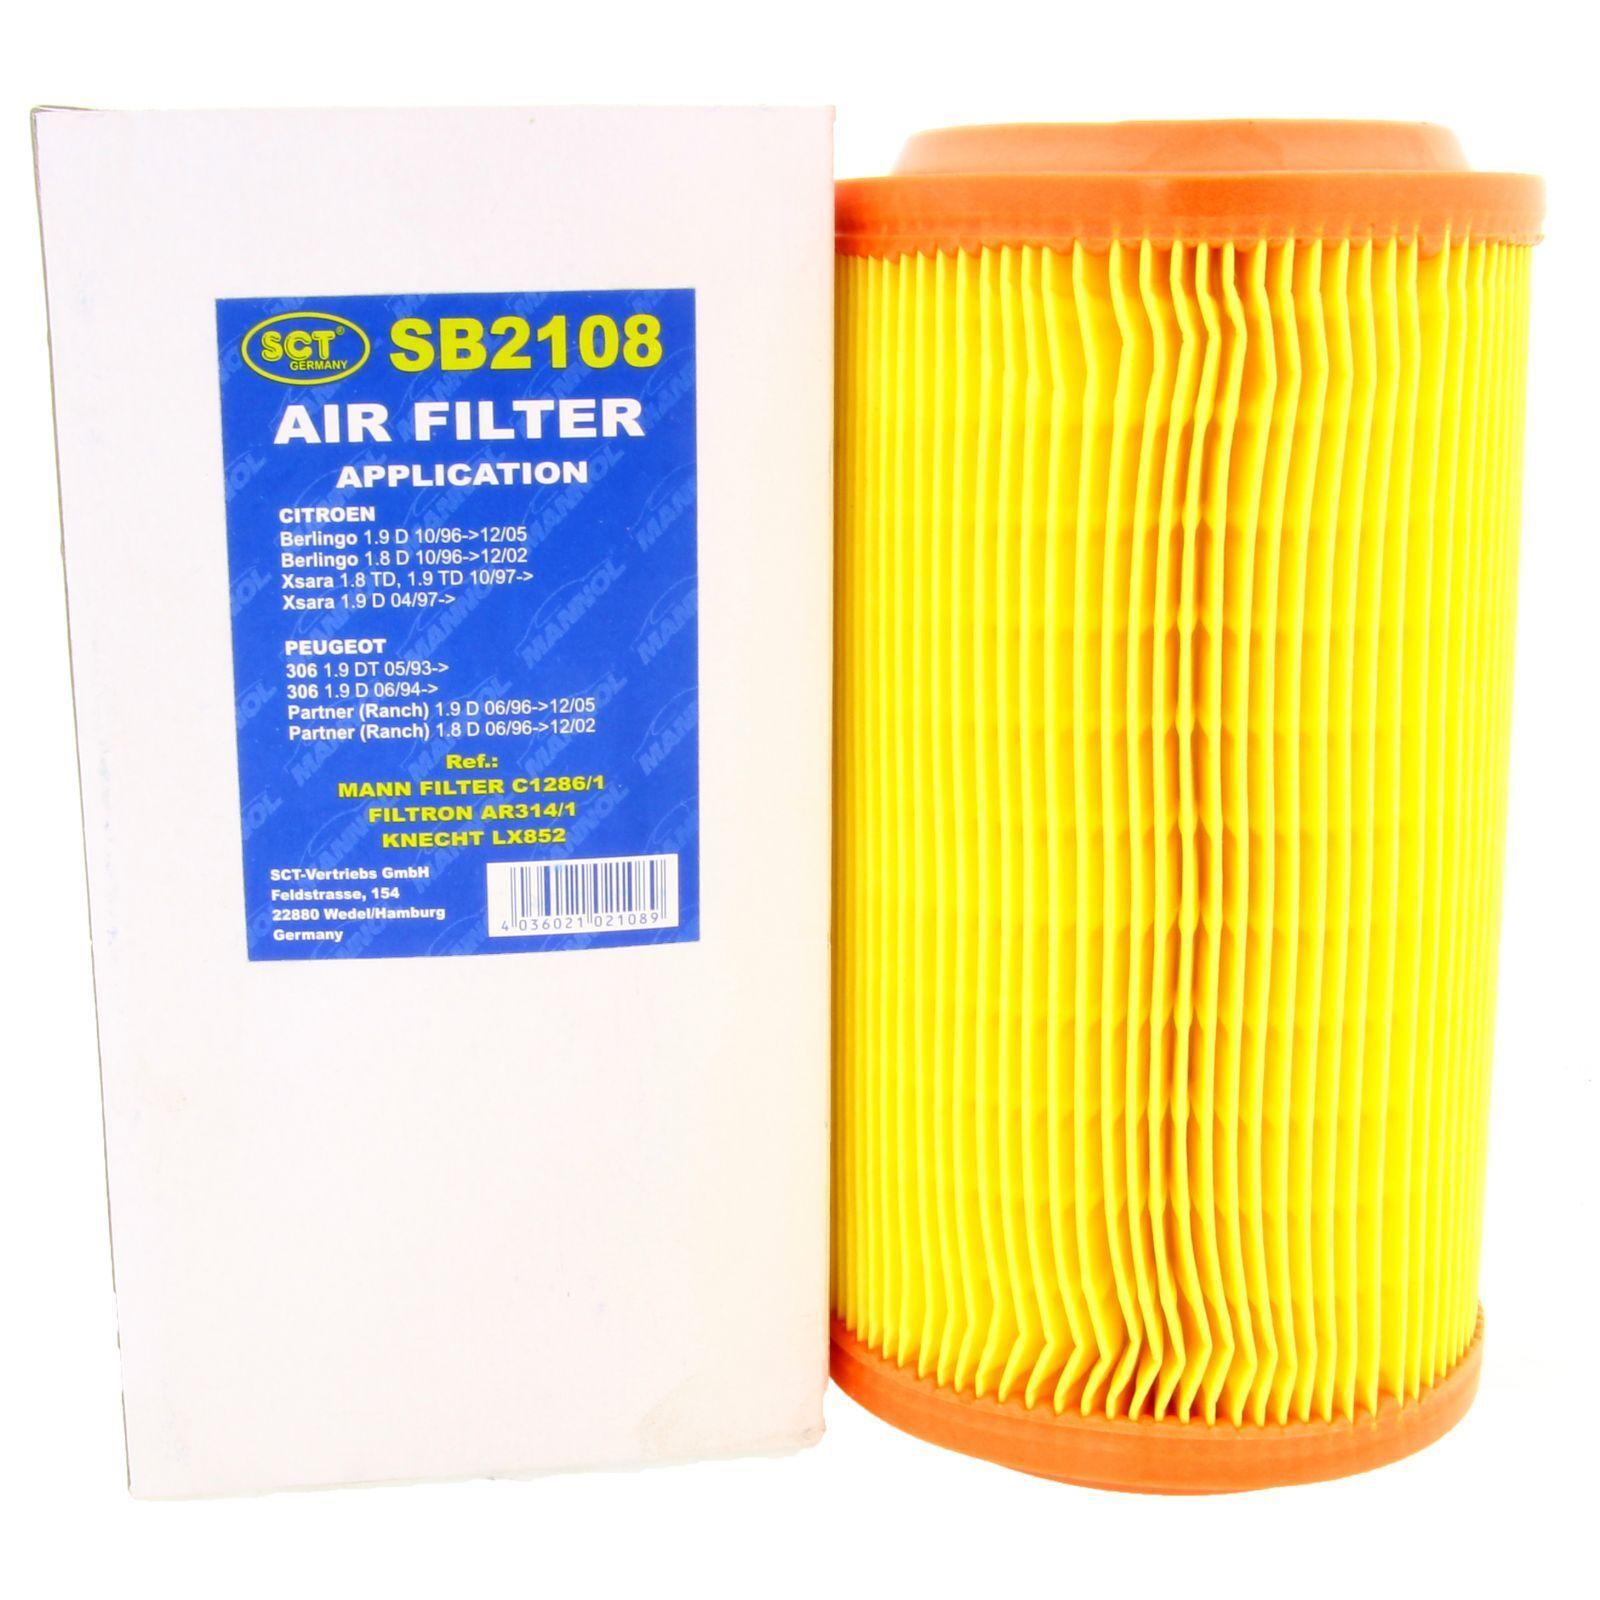 SCT Germany Luftfilter SB2172